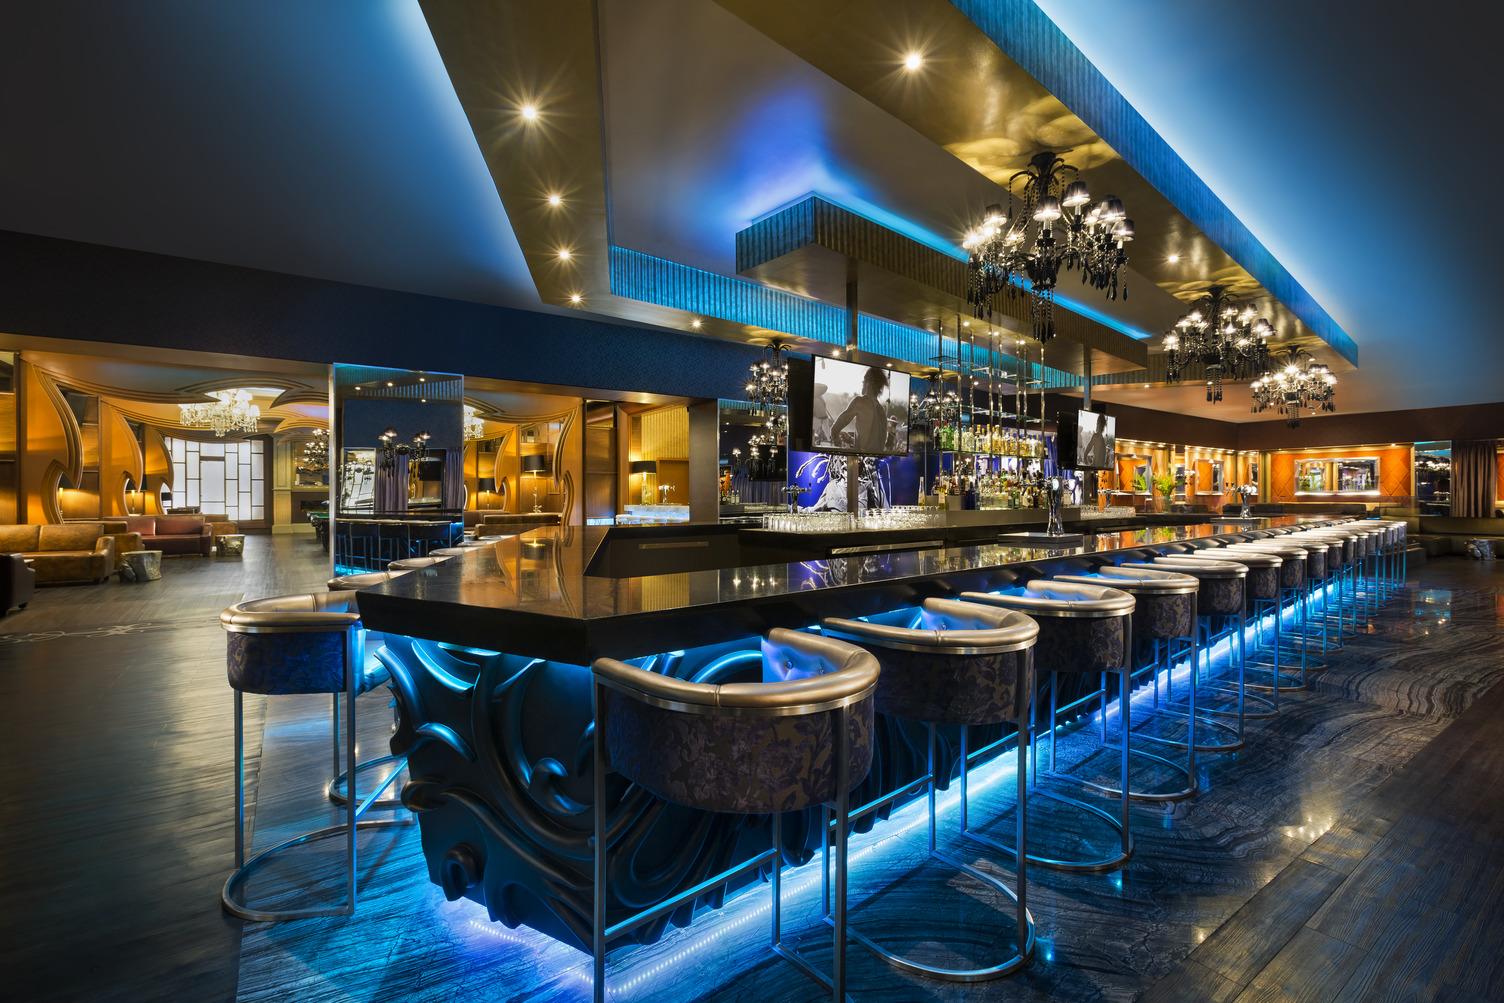 Travel Agency All-Inclusive Resort Heaven at Hard Rock Hotel Riviera Maya 53